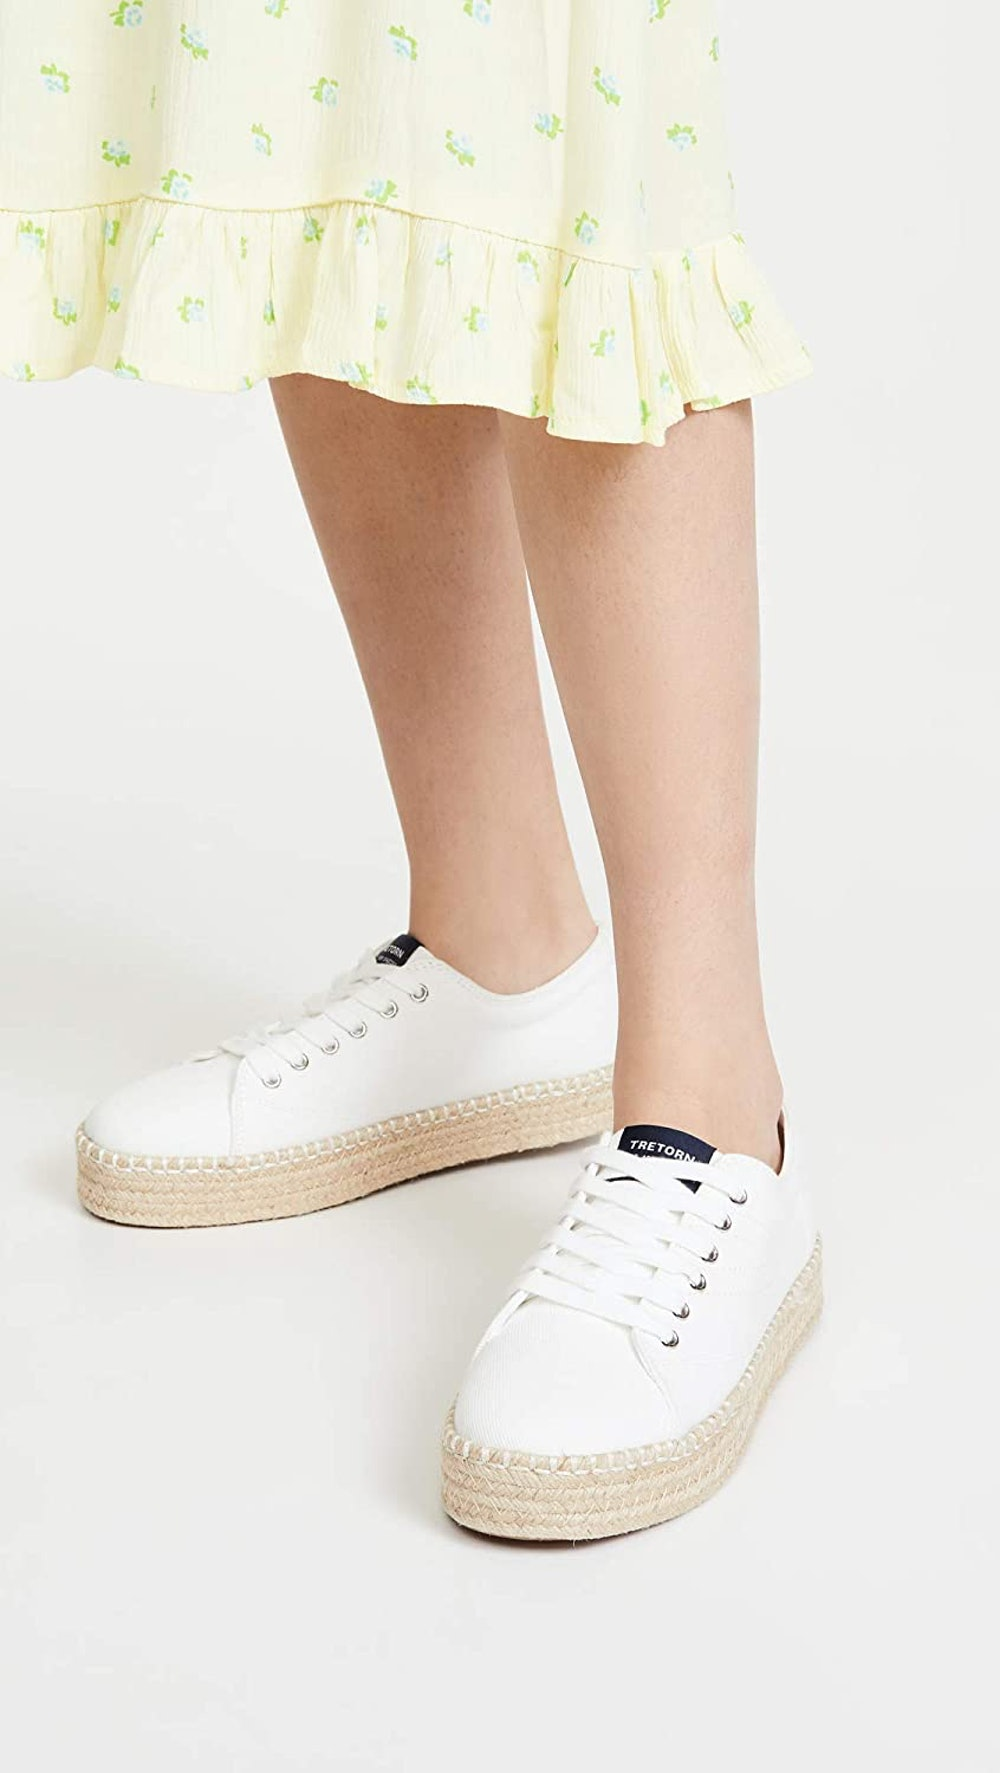 TRETORN Women's EVE Sneakers